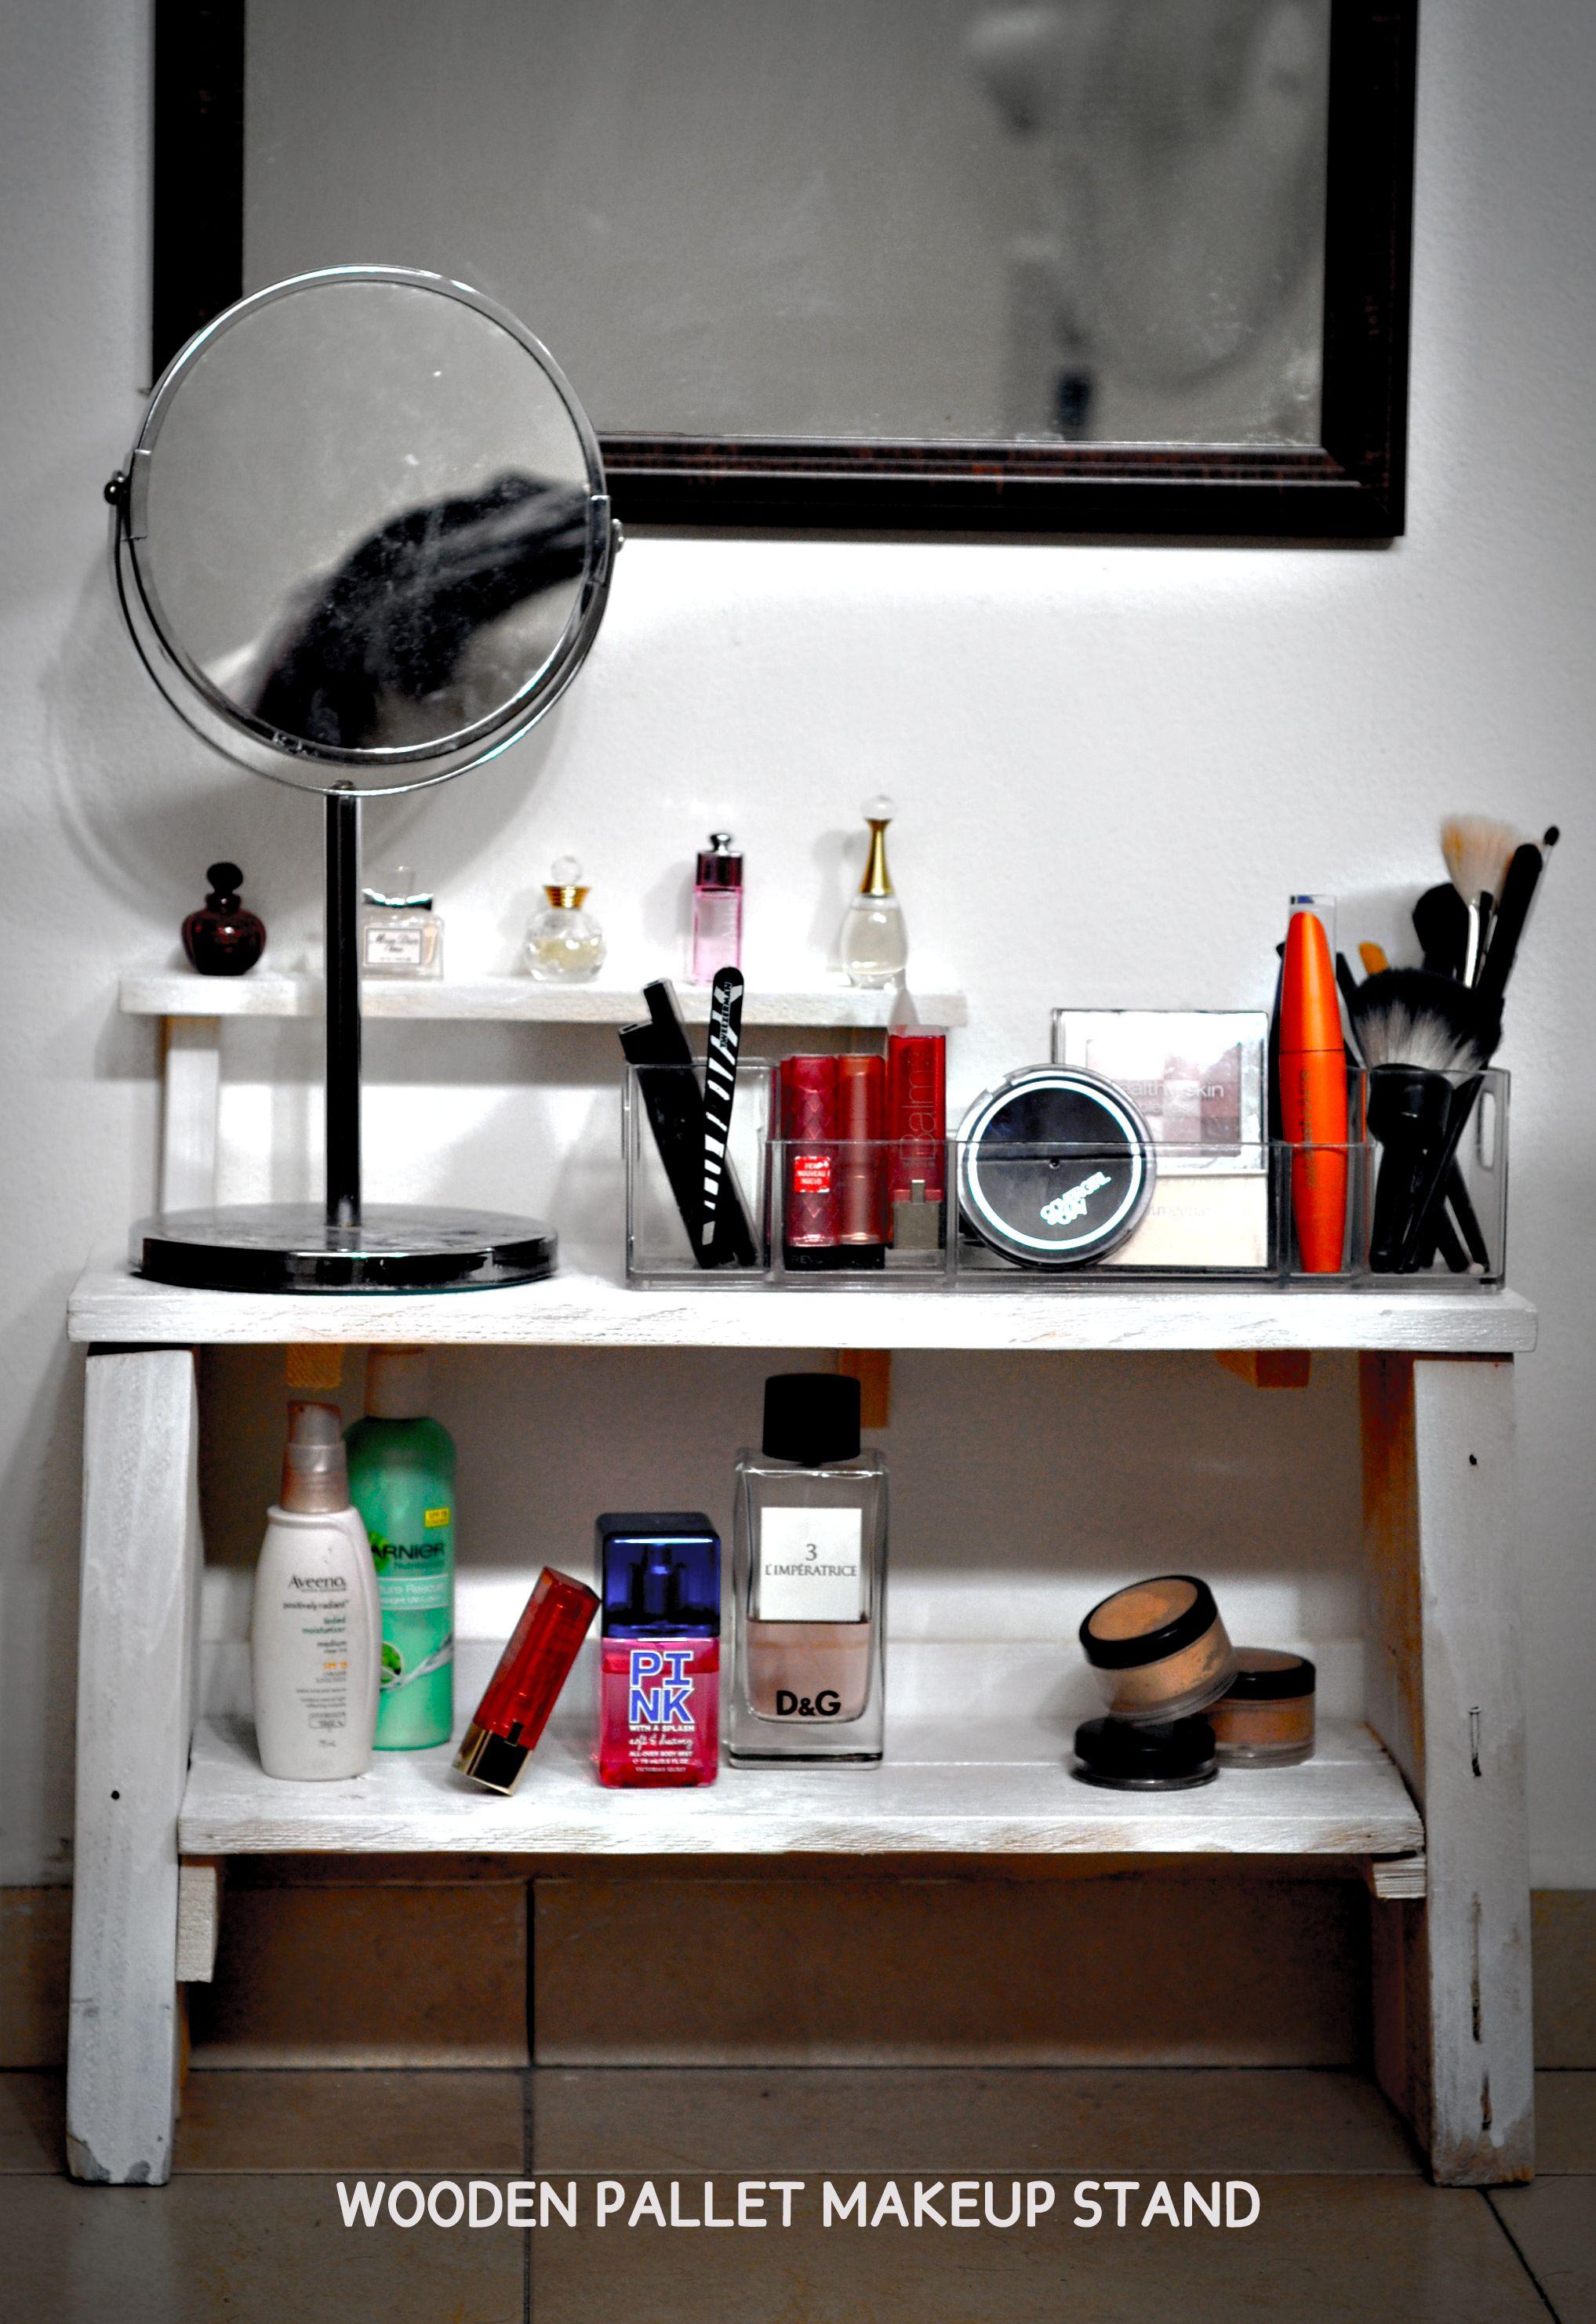 wooden pallet makeup stand diy woodenpallet makeup